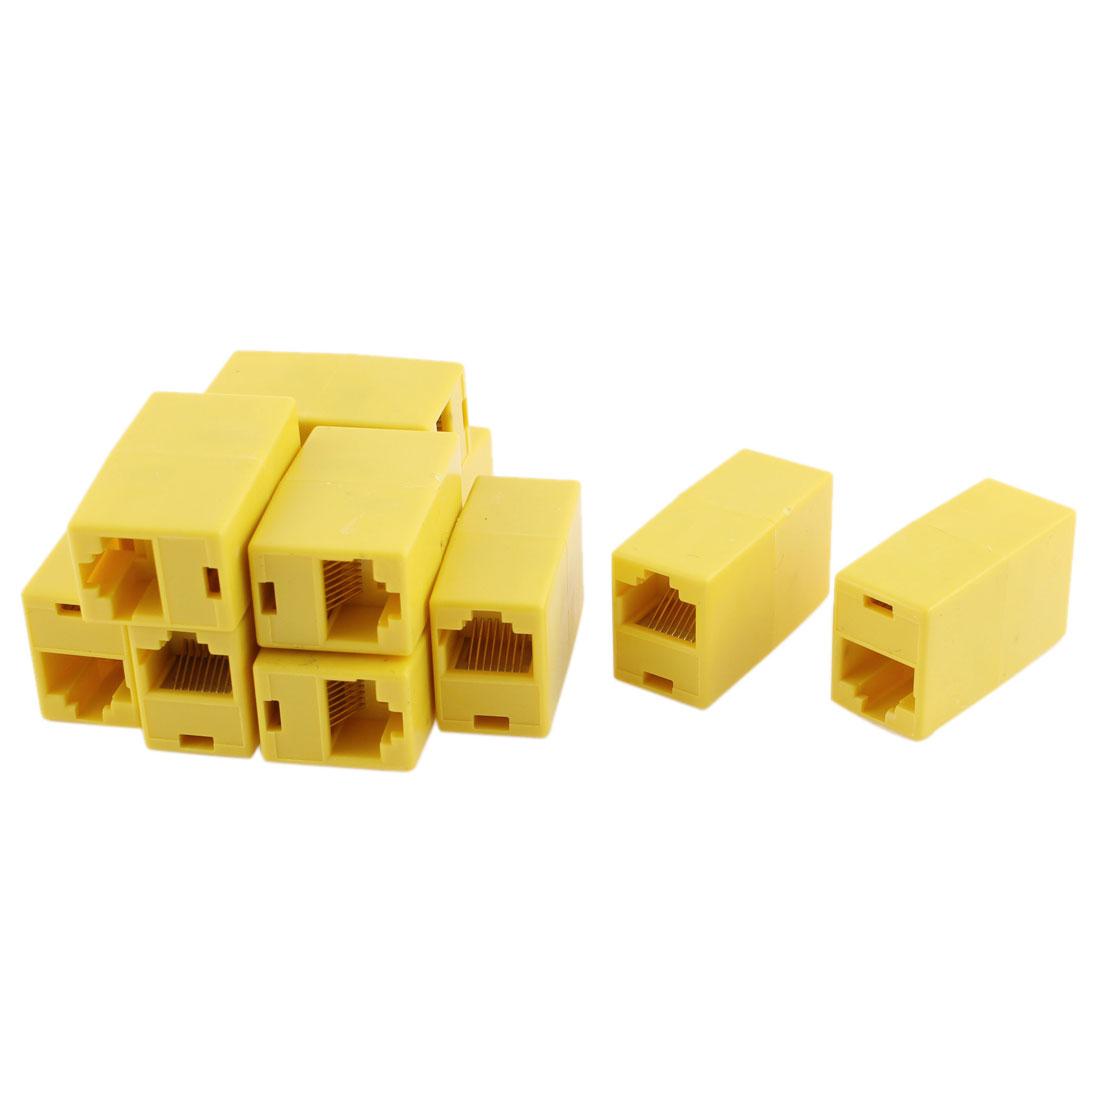 Cat5 RJ45 Lan Network Ethernet Cable Extender Joiner Adapter Coupler 10 PCS